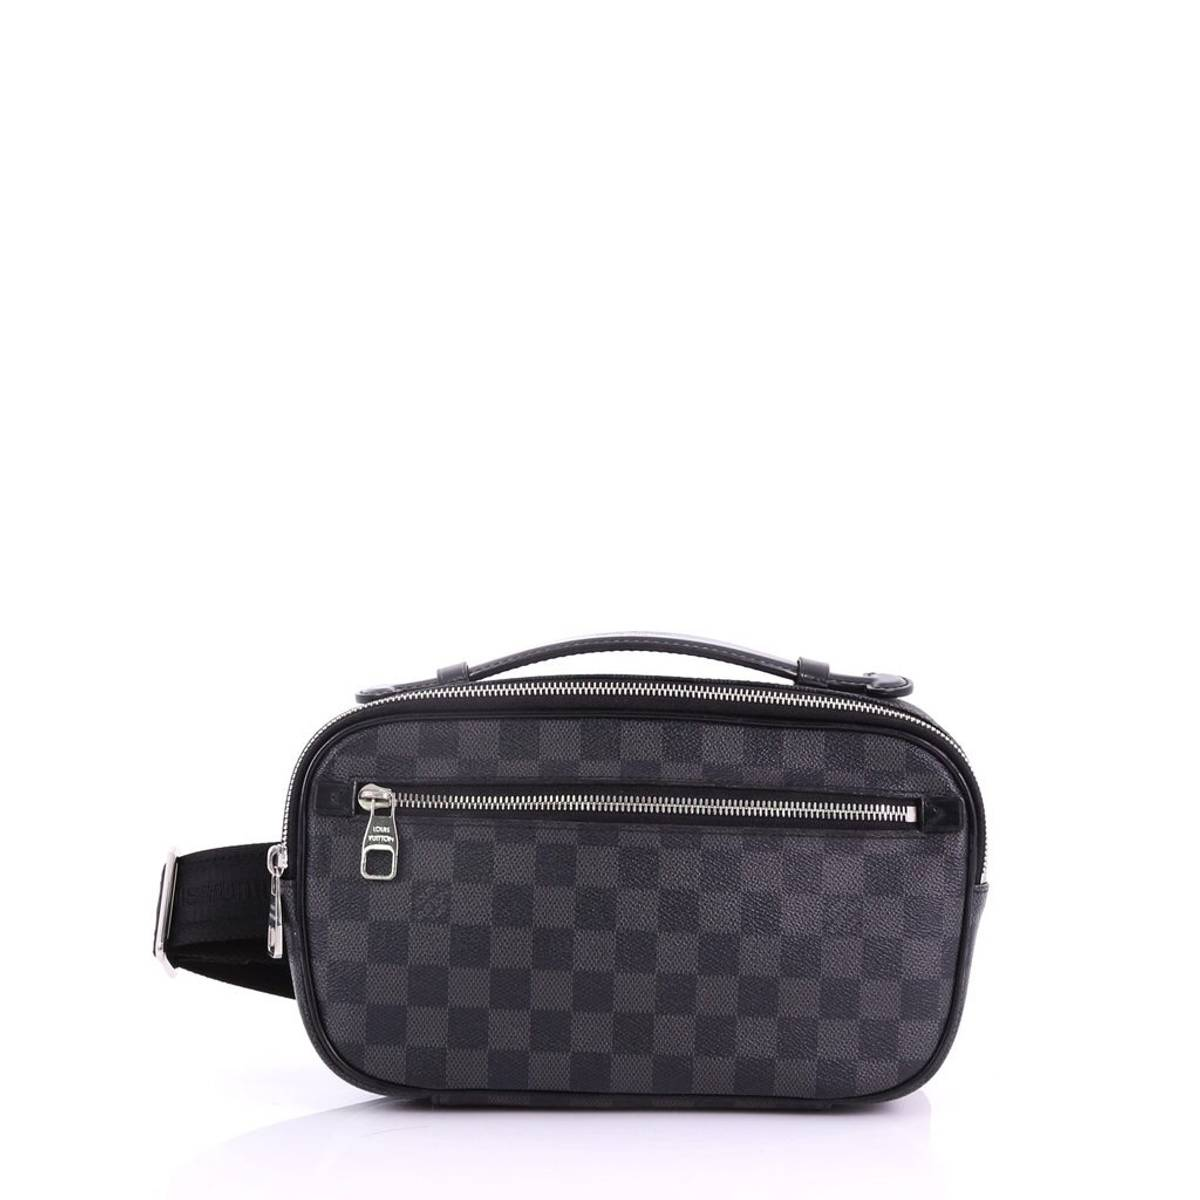 e3769804705f Louis Vuitton Louis Vuitton Ambler Damier Crossbody Bag Size one size - Bags    Luggage for Sale - Grailed